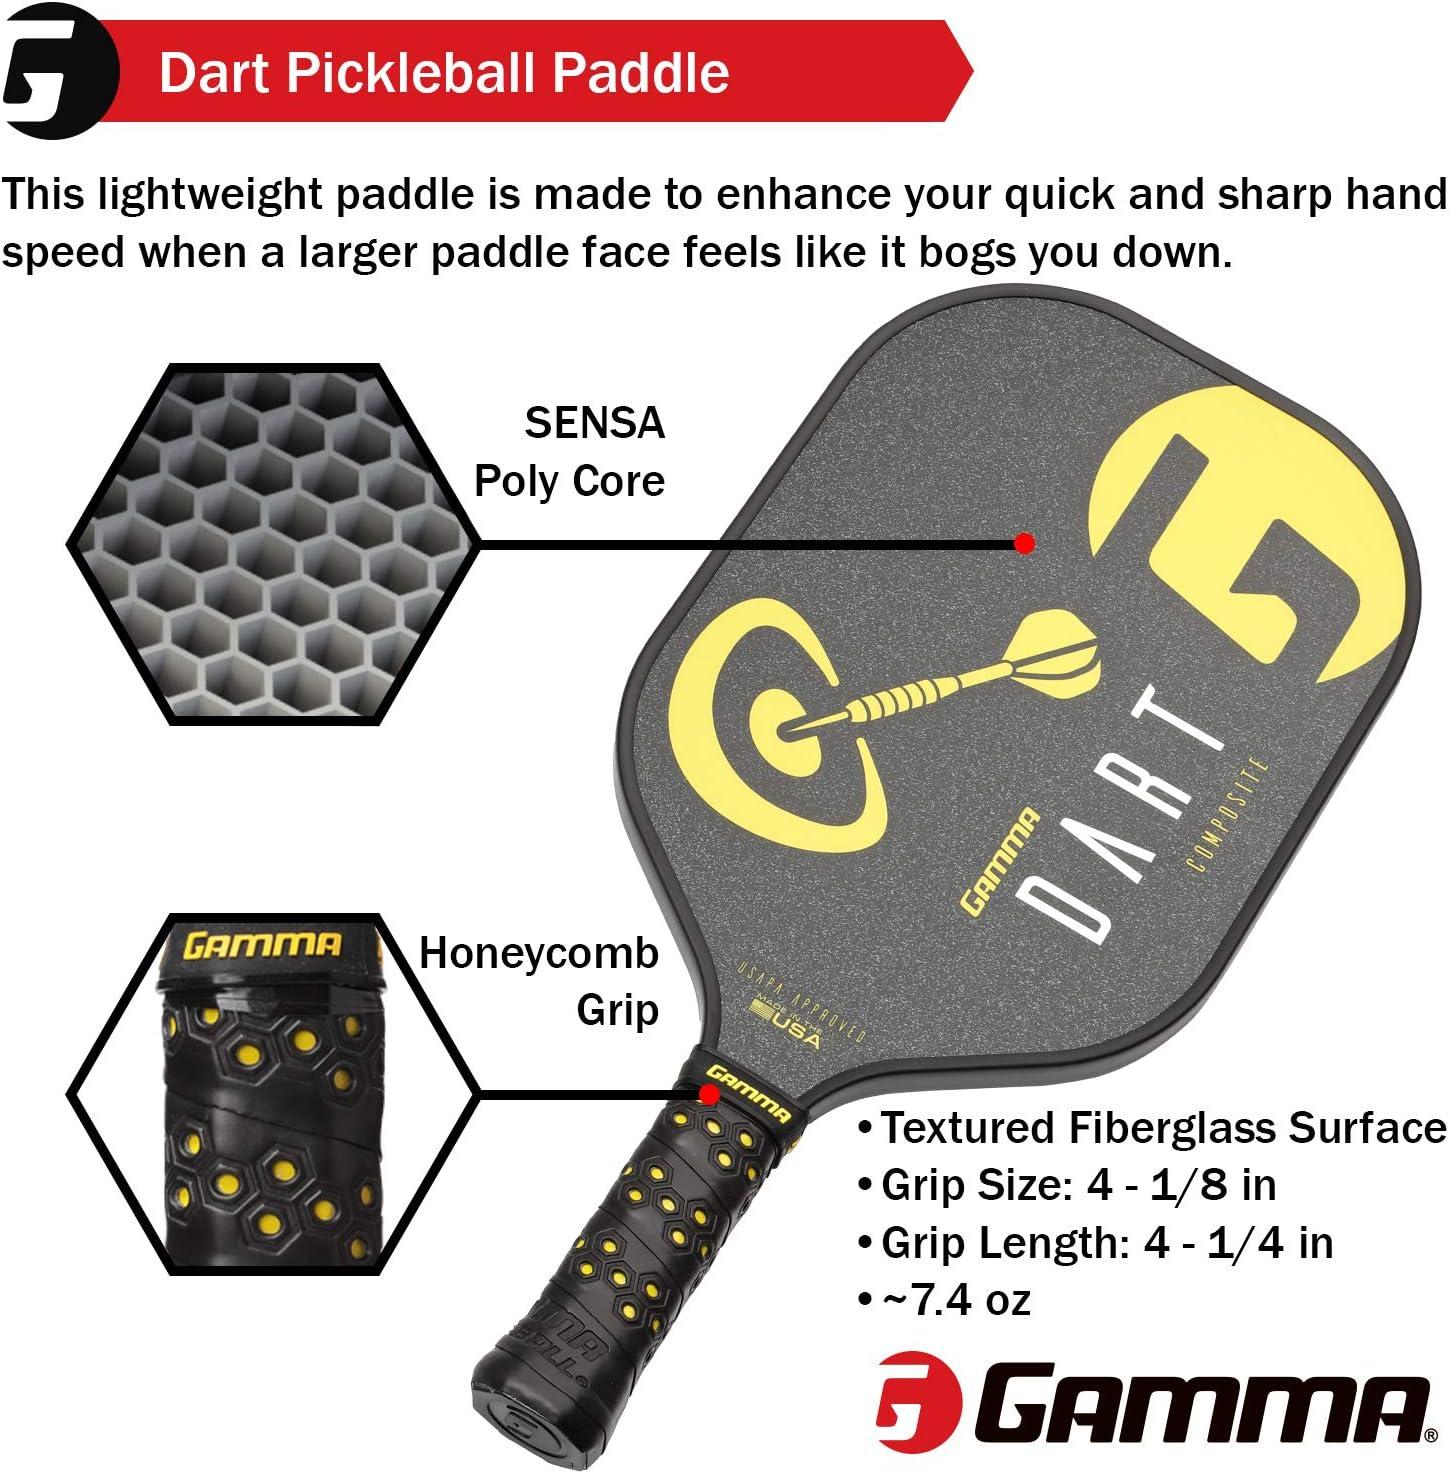 Amazon.com: Pala de Pickleball GAMMA Poly Core: paletas de ...